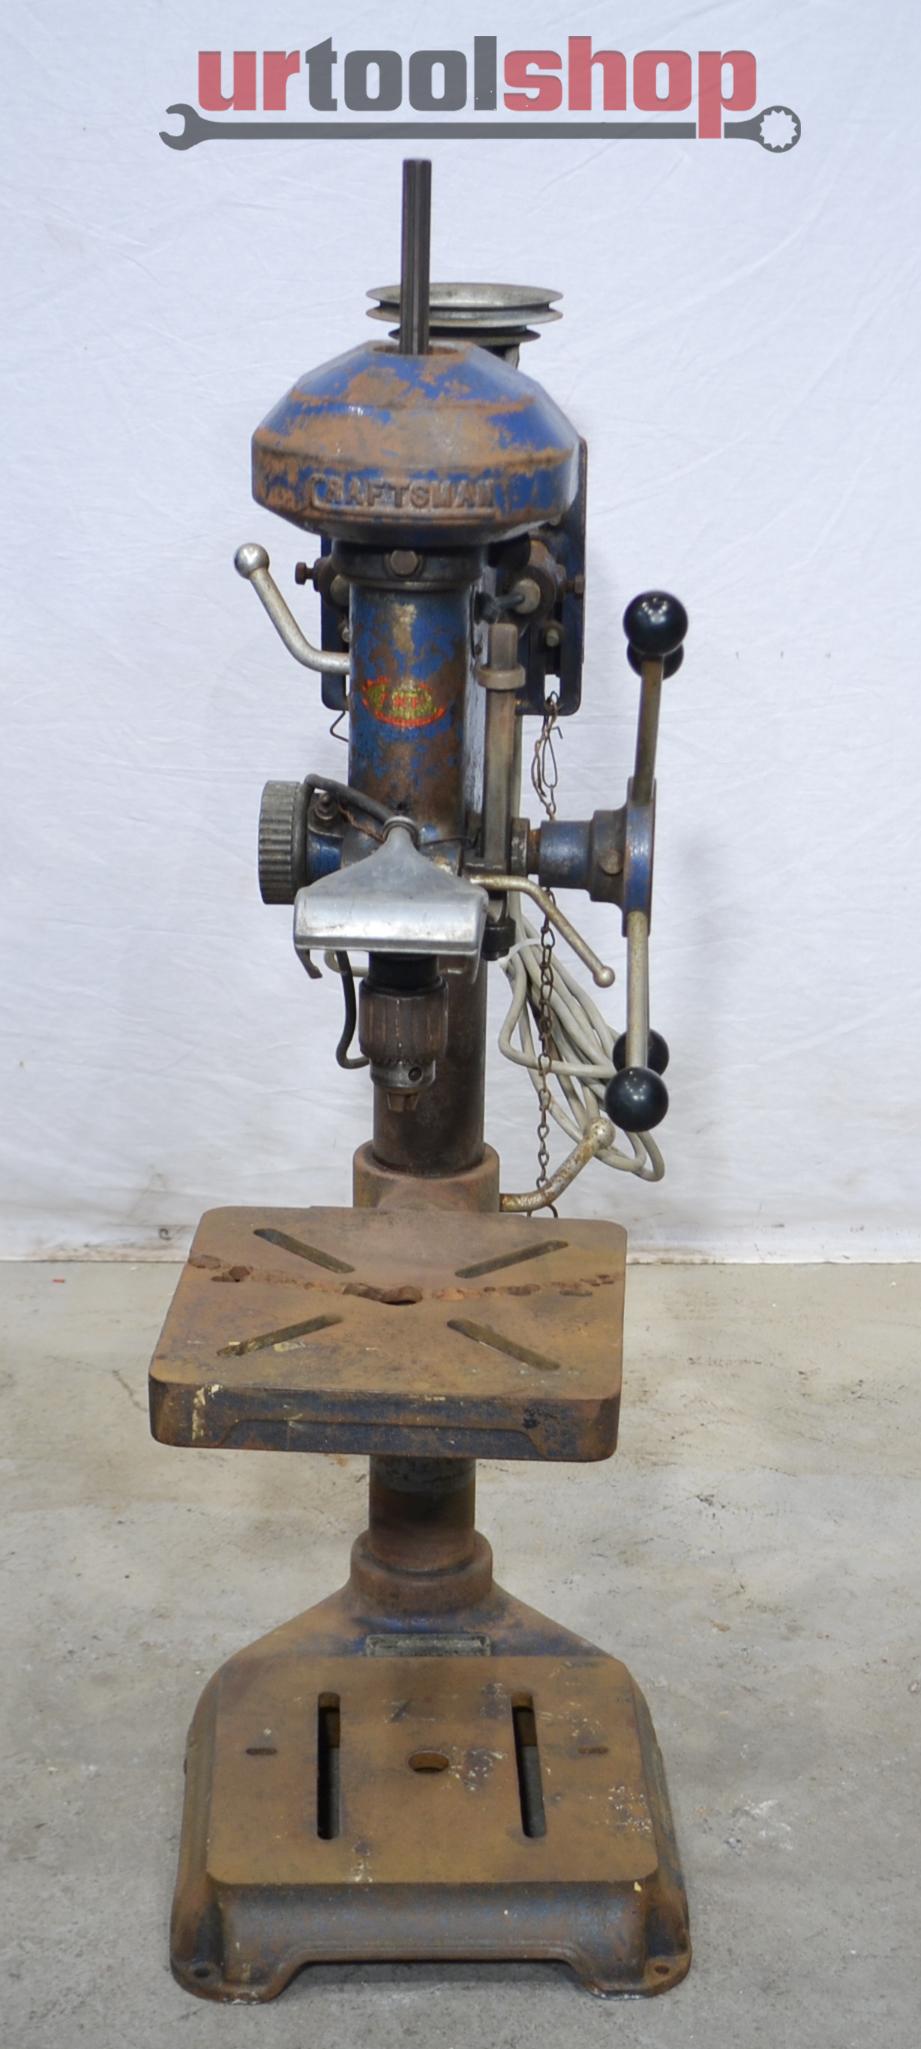 vintage craftsman bench drill press model 101 03622 9414 2